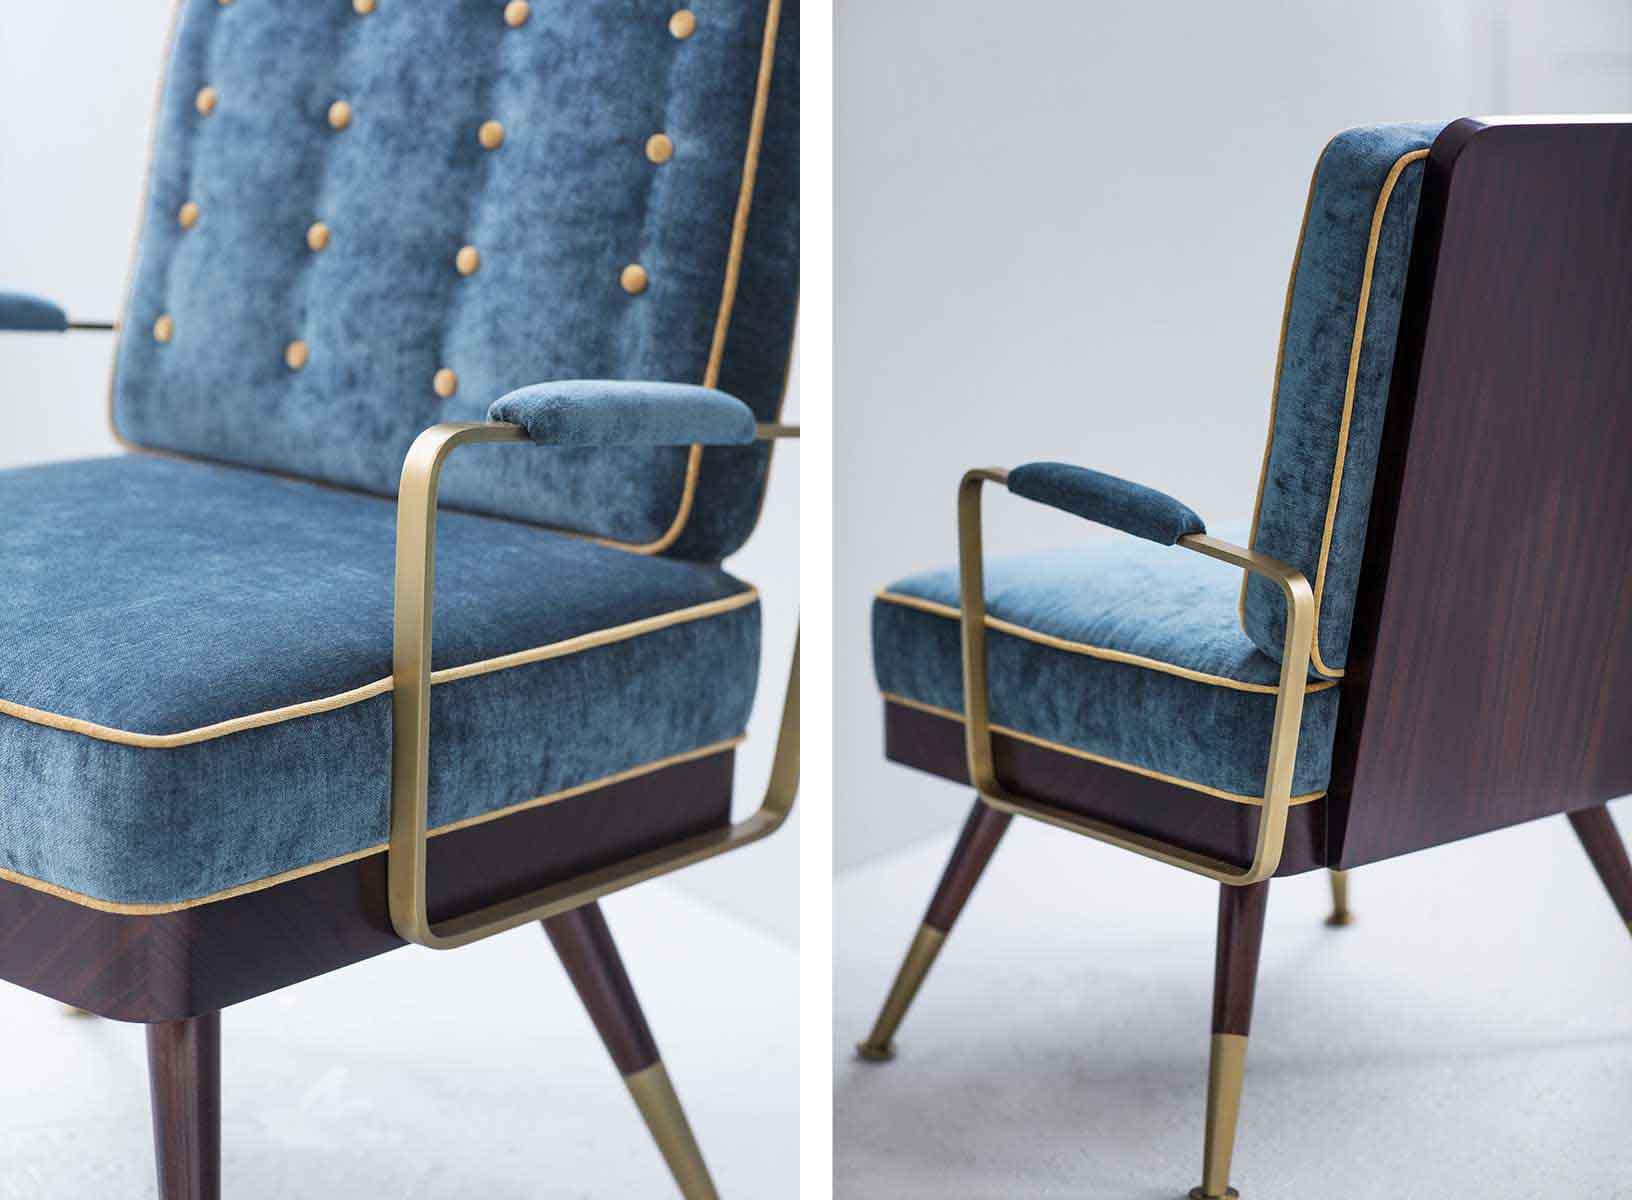 Bert Frank furniture_Armchair details5_mid-century modern furniture_Decca London.jpg copy